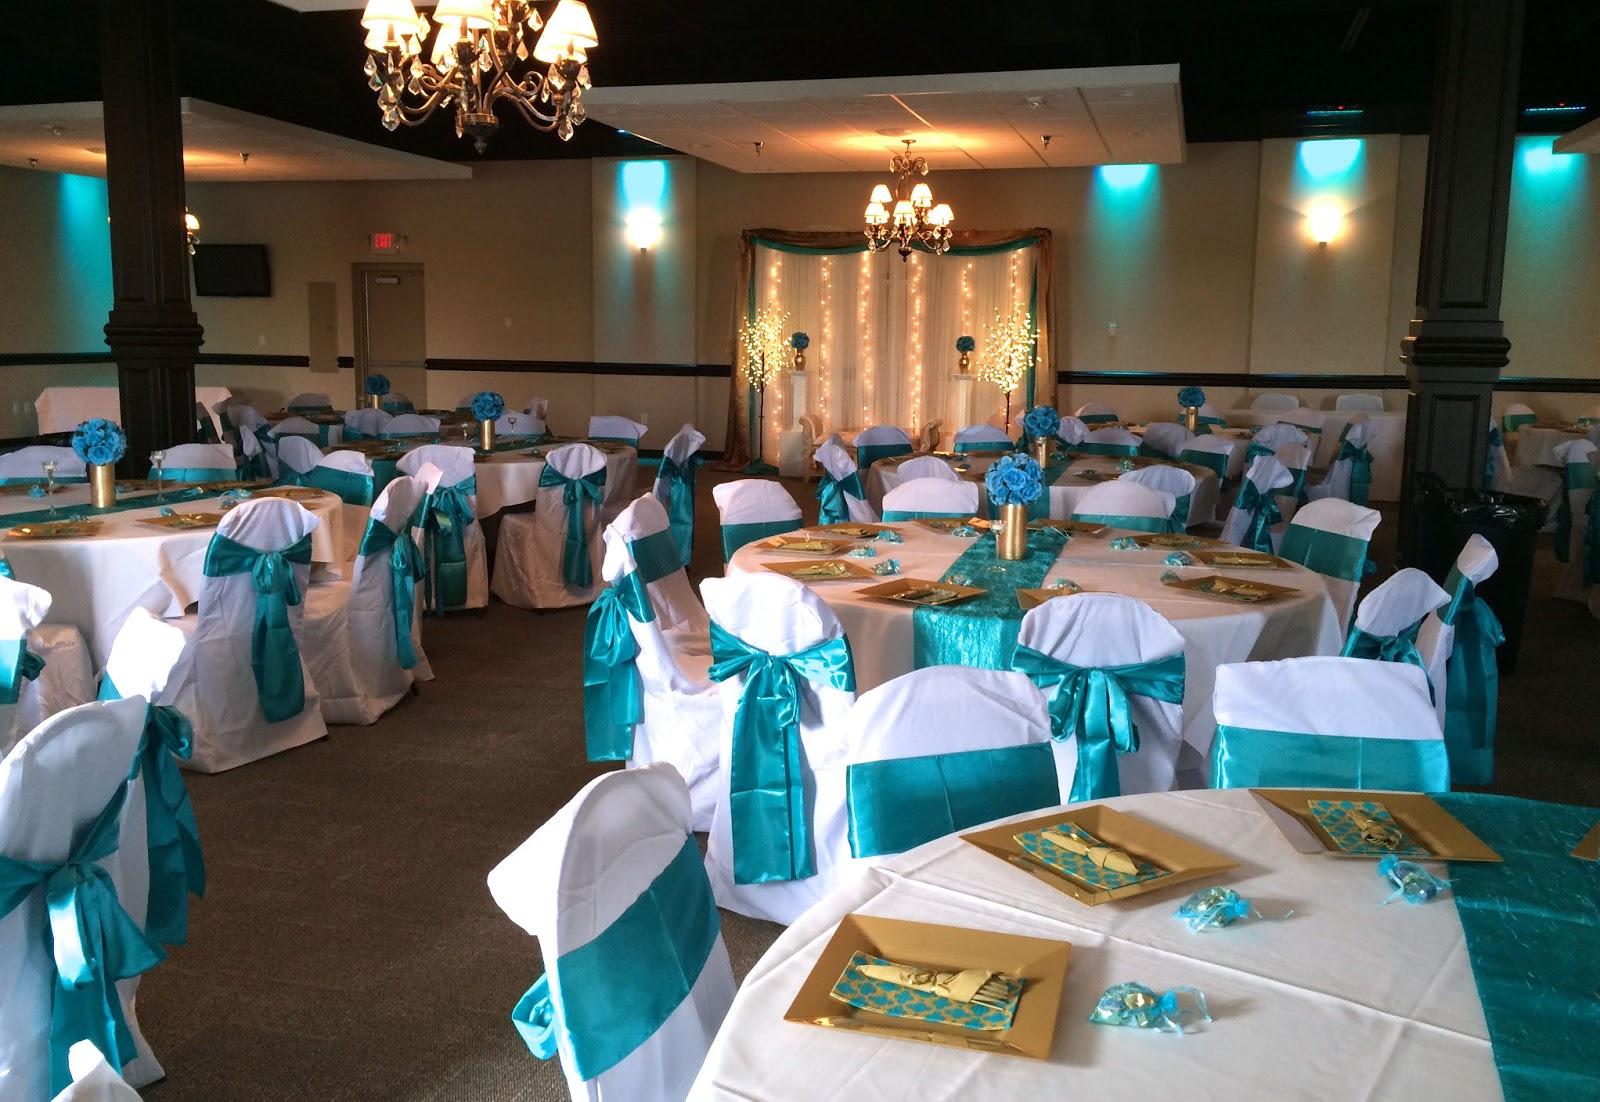 Turquoise And Yellow Wedding Ideas: Elegantly Expressed Wedding Decor: August 2015